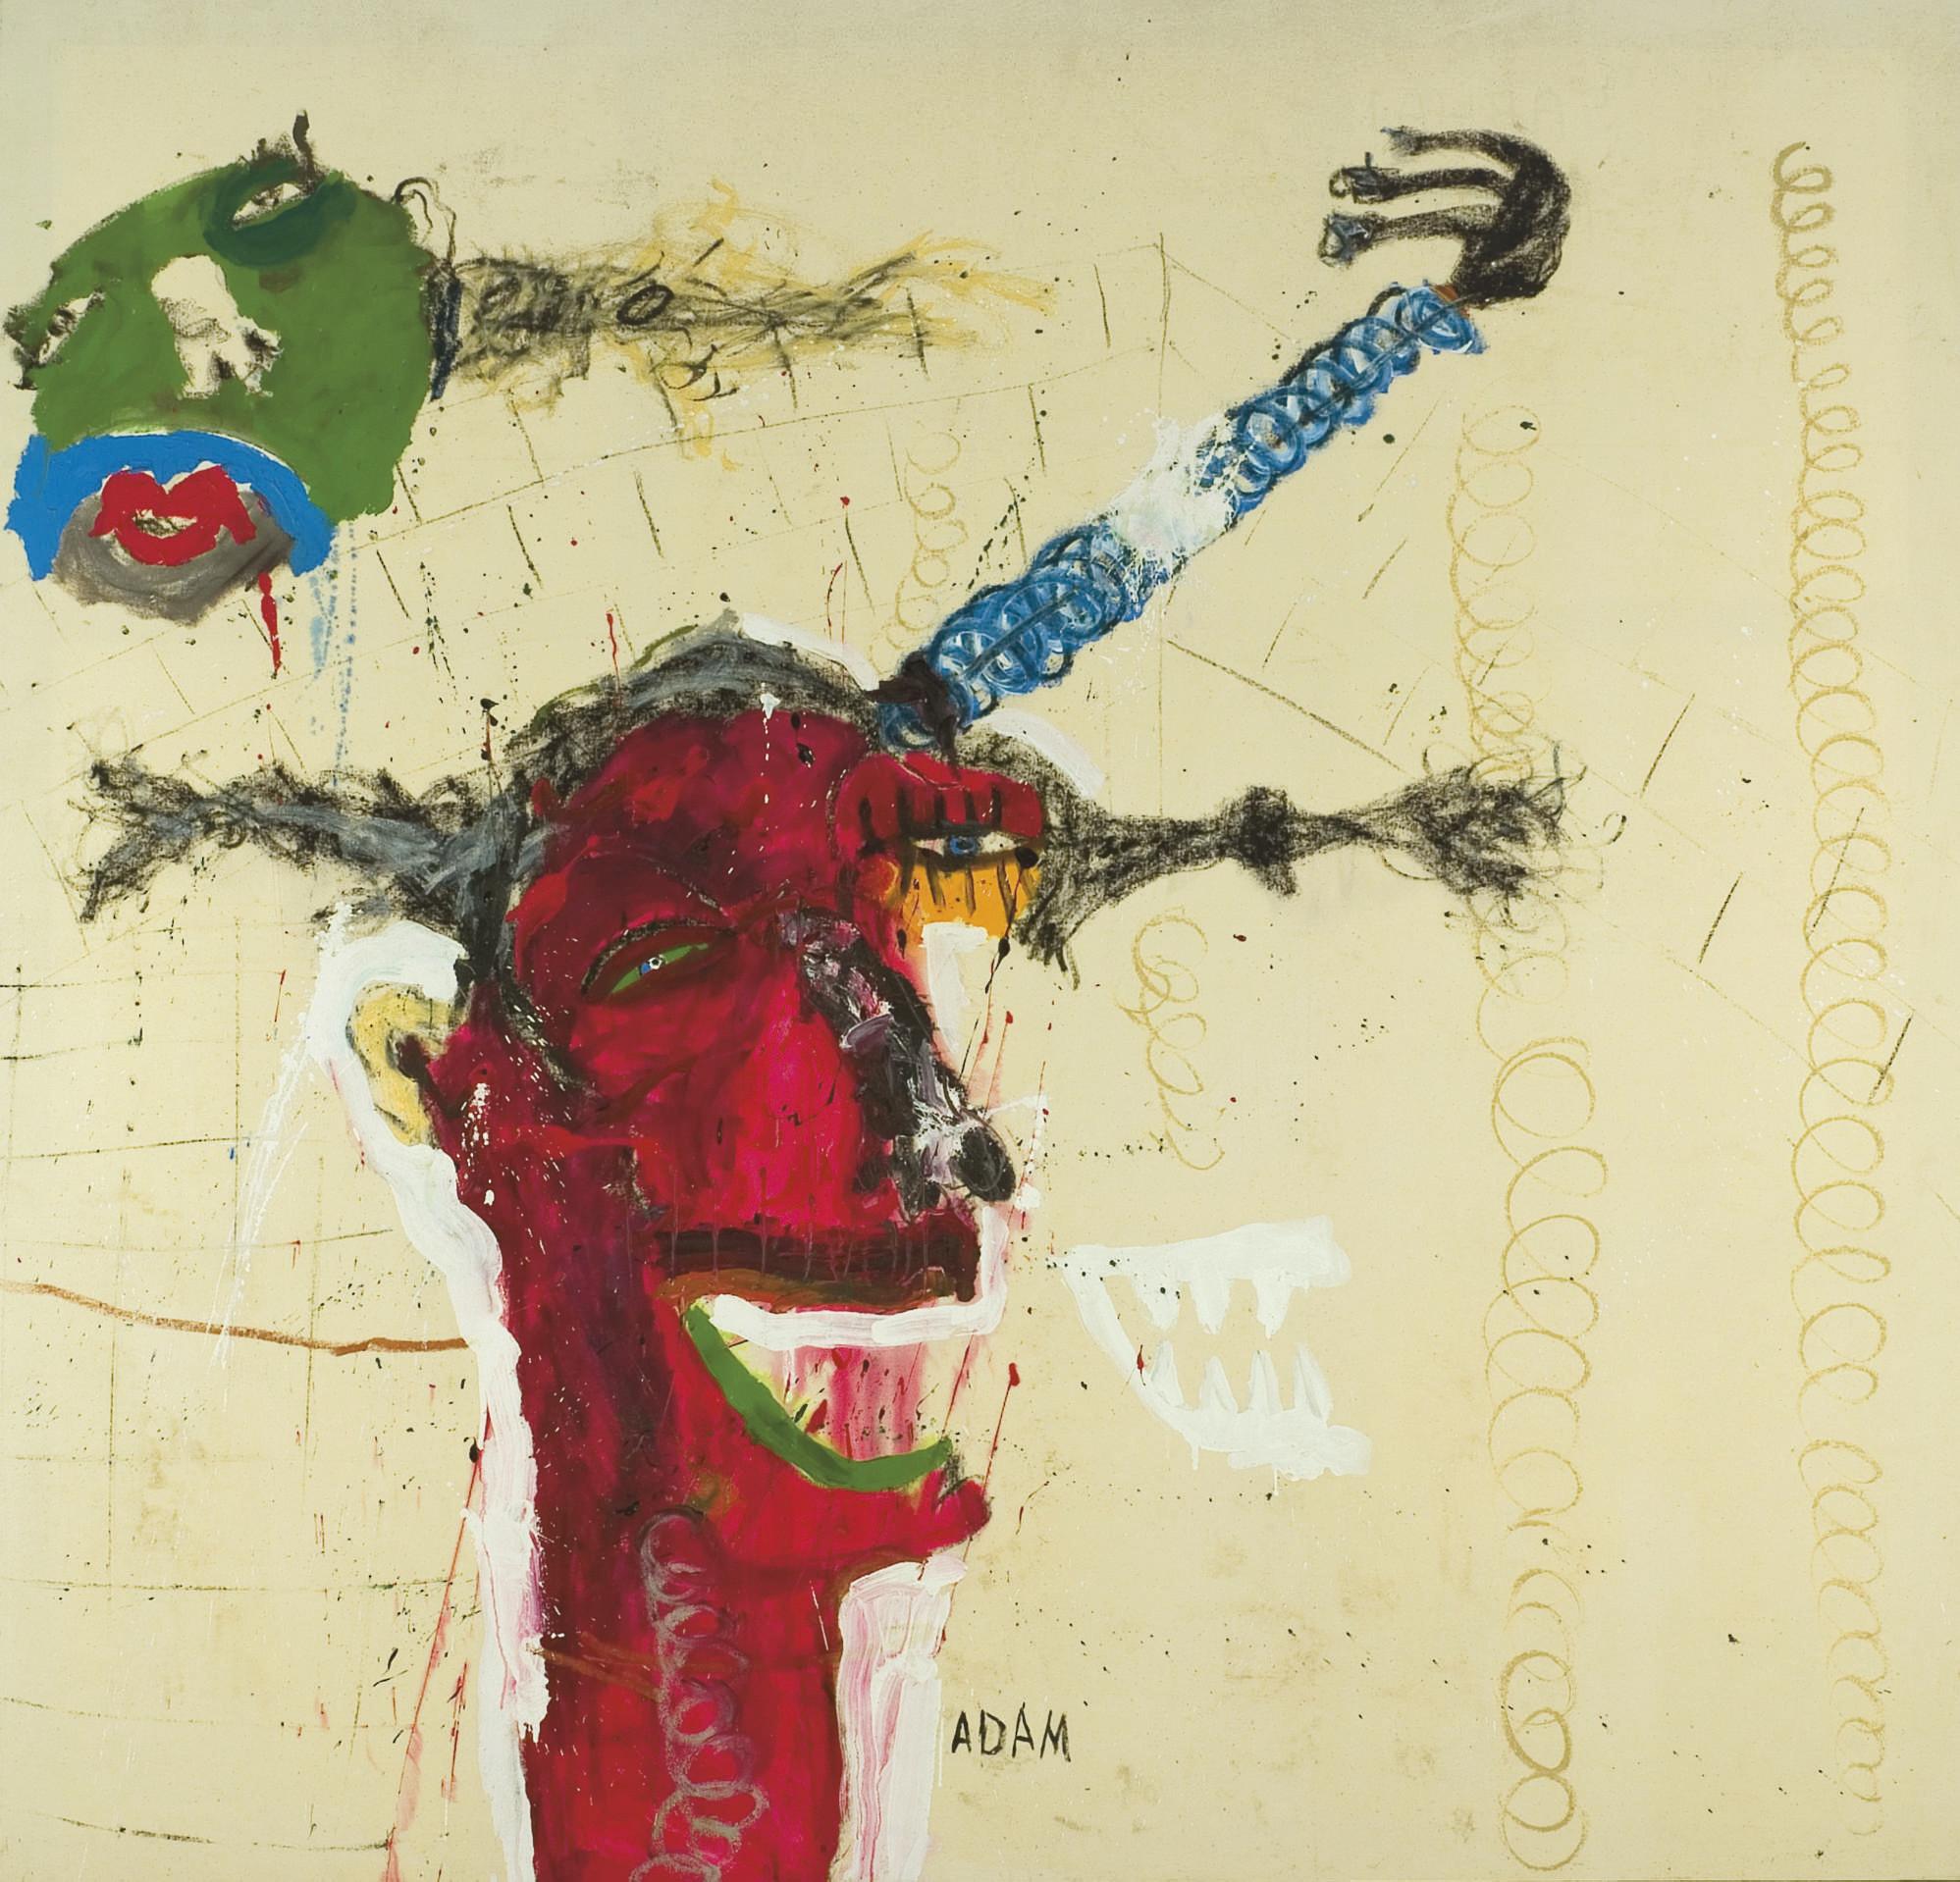 Sabhan Adam (Syrian, b.1972)